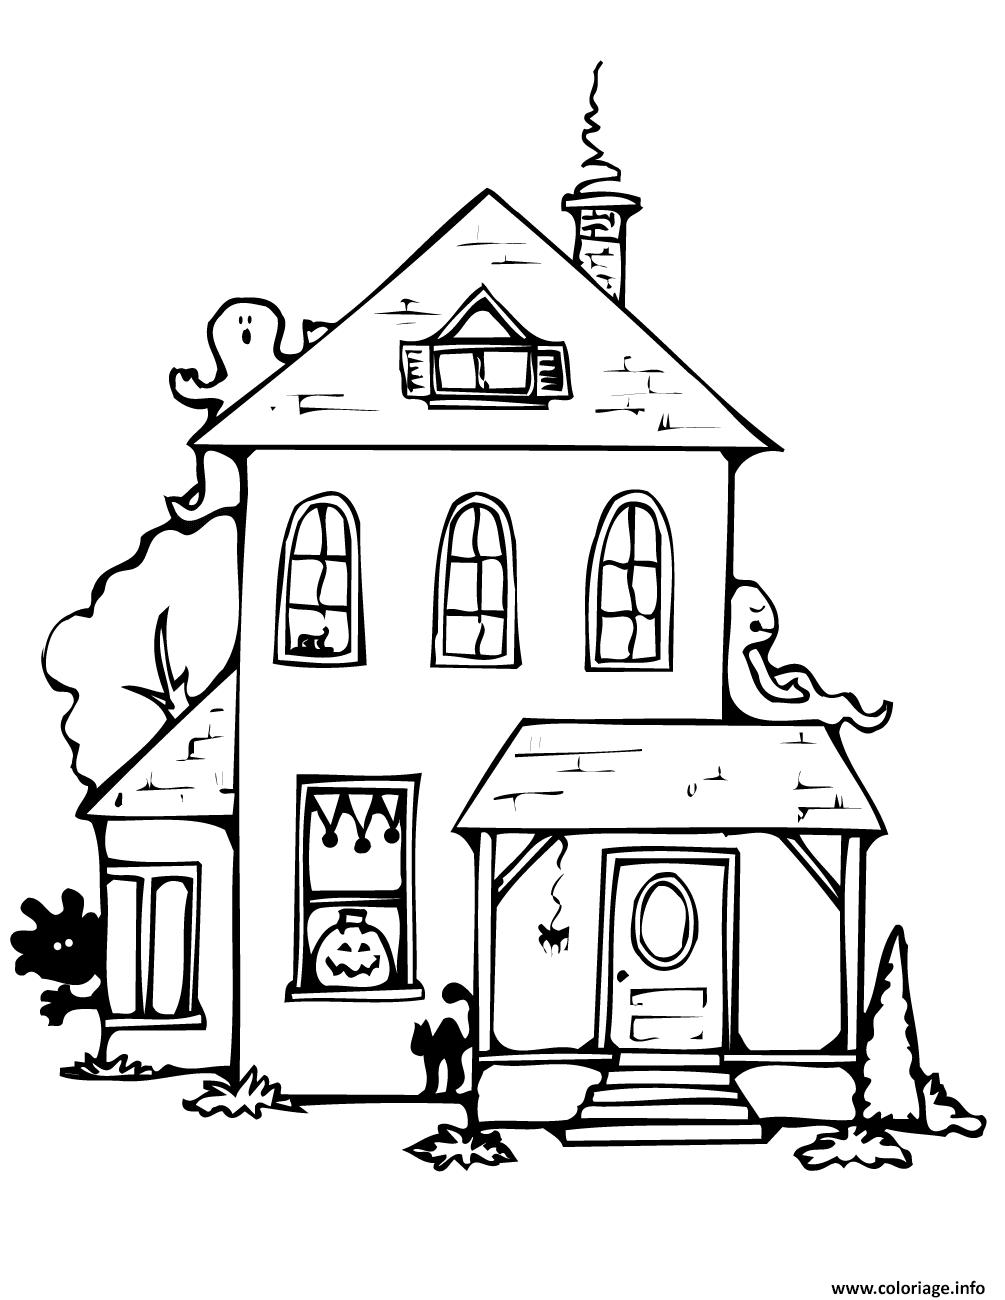 Coloriage maison hantee halloween avec fantomes dessin